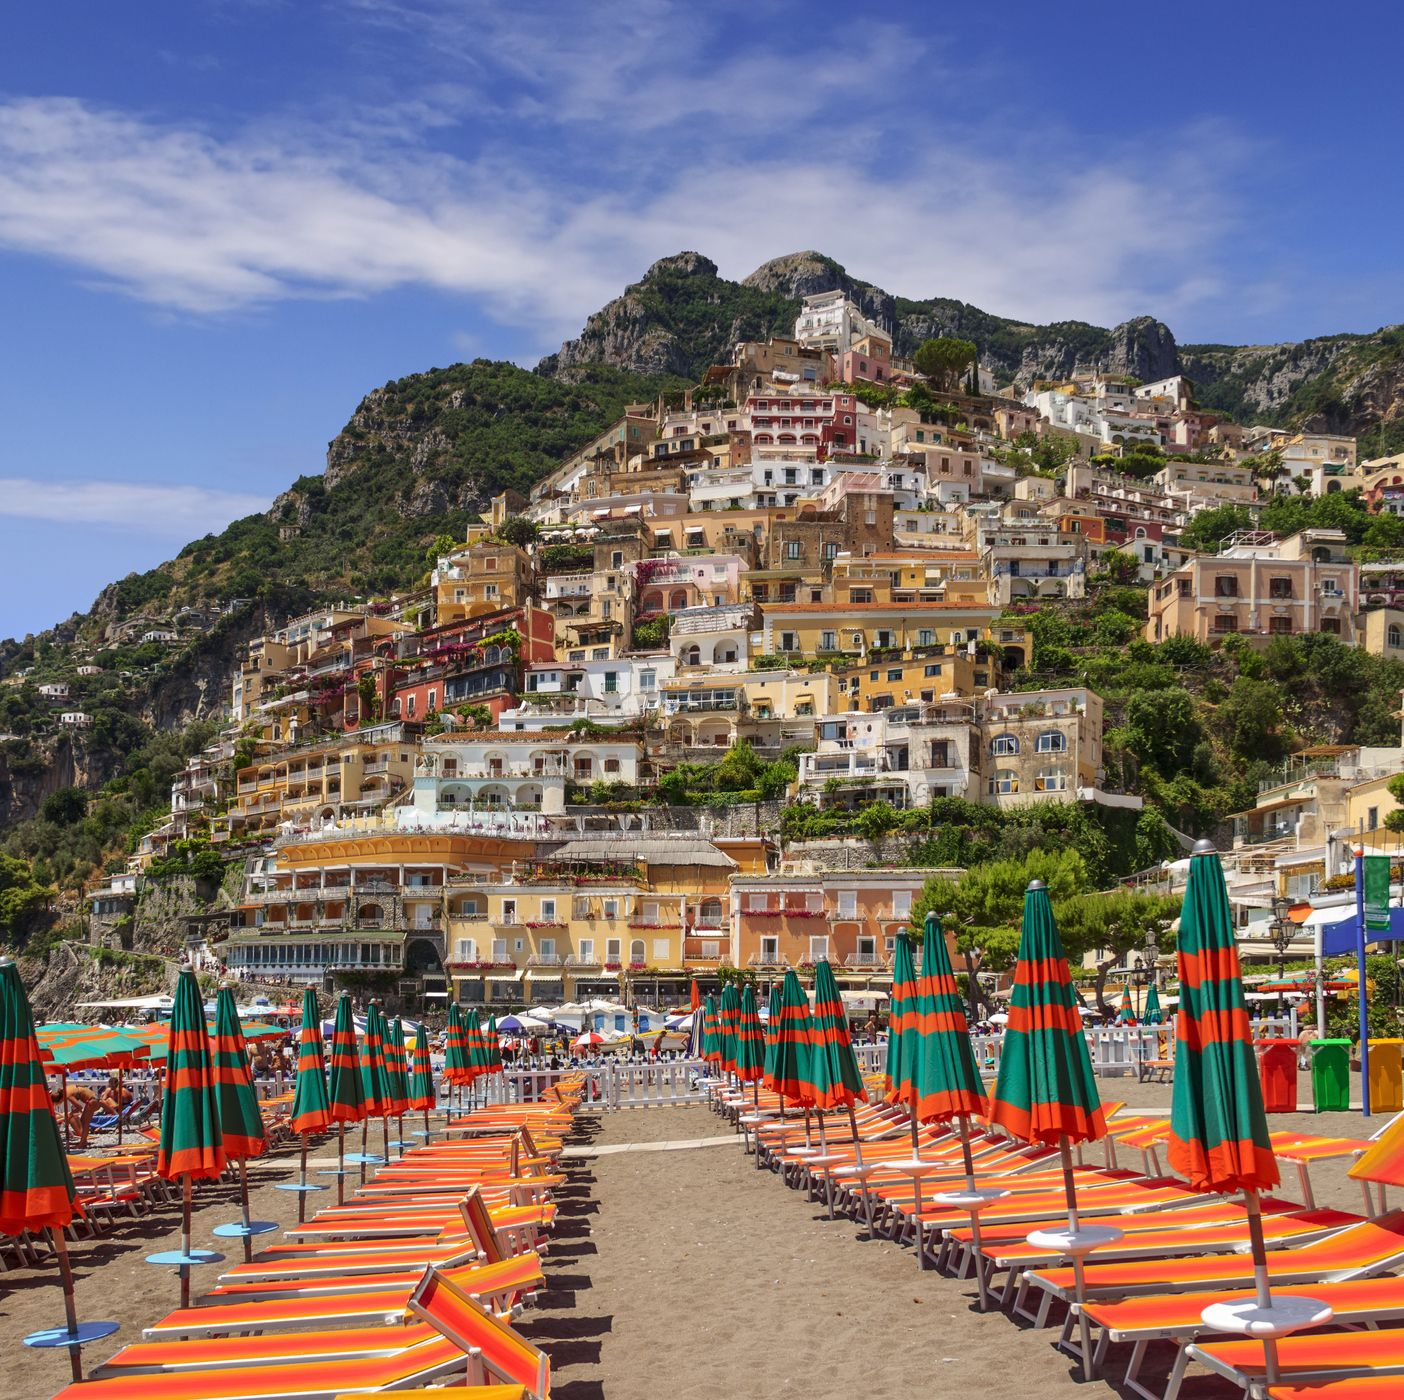 Beach holidays in Italy: Neapolitan Riviera